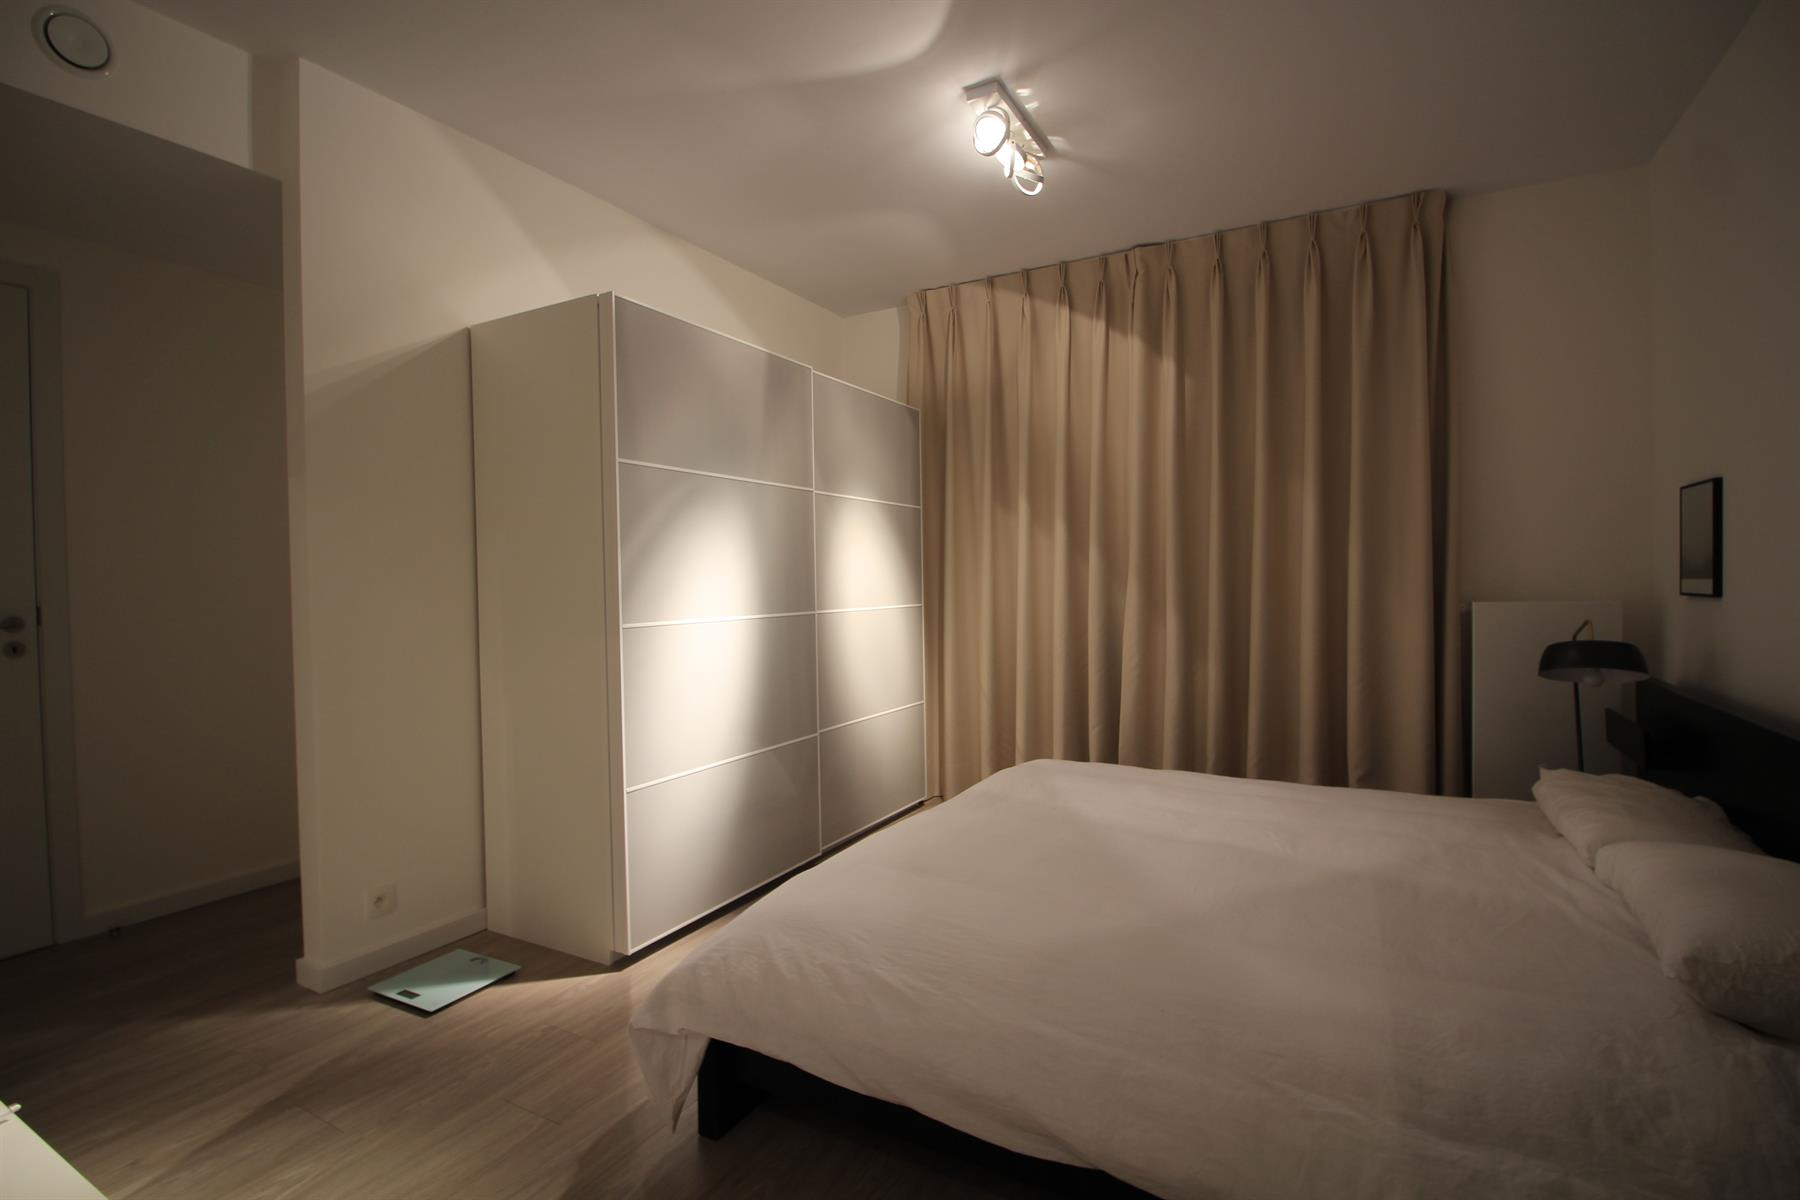 Appartement - Woluwe-Saint-Lambert - #4092326-5